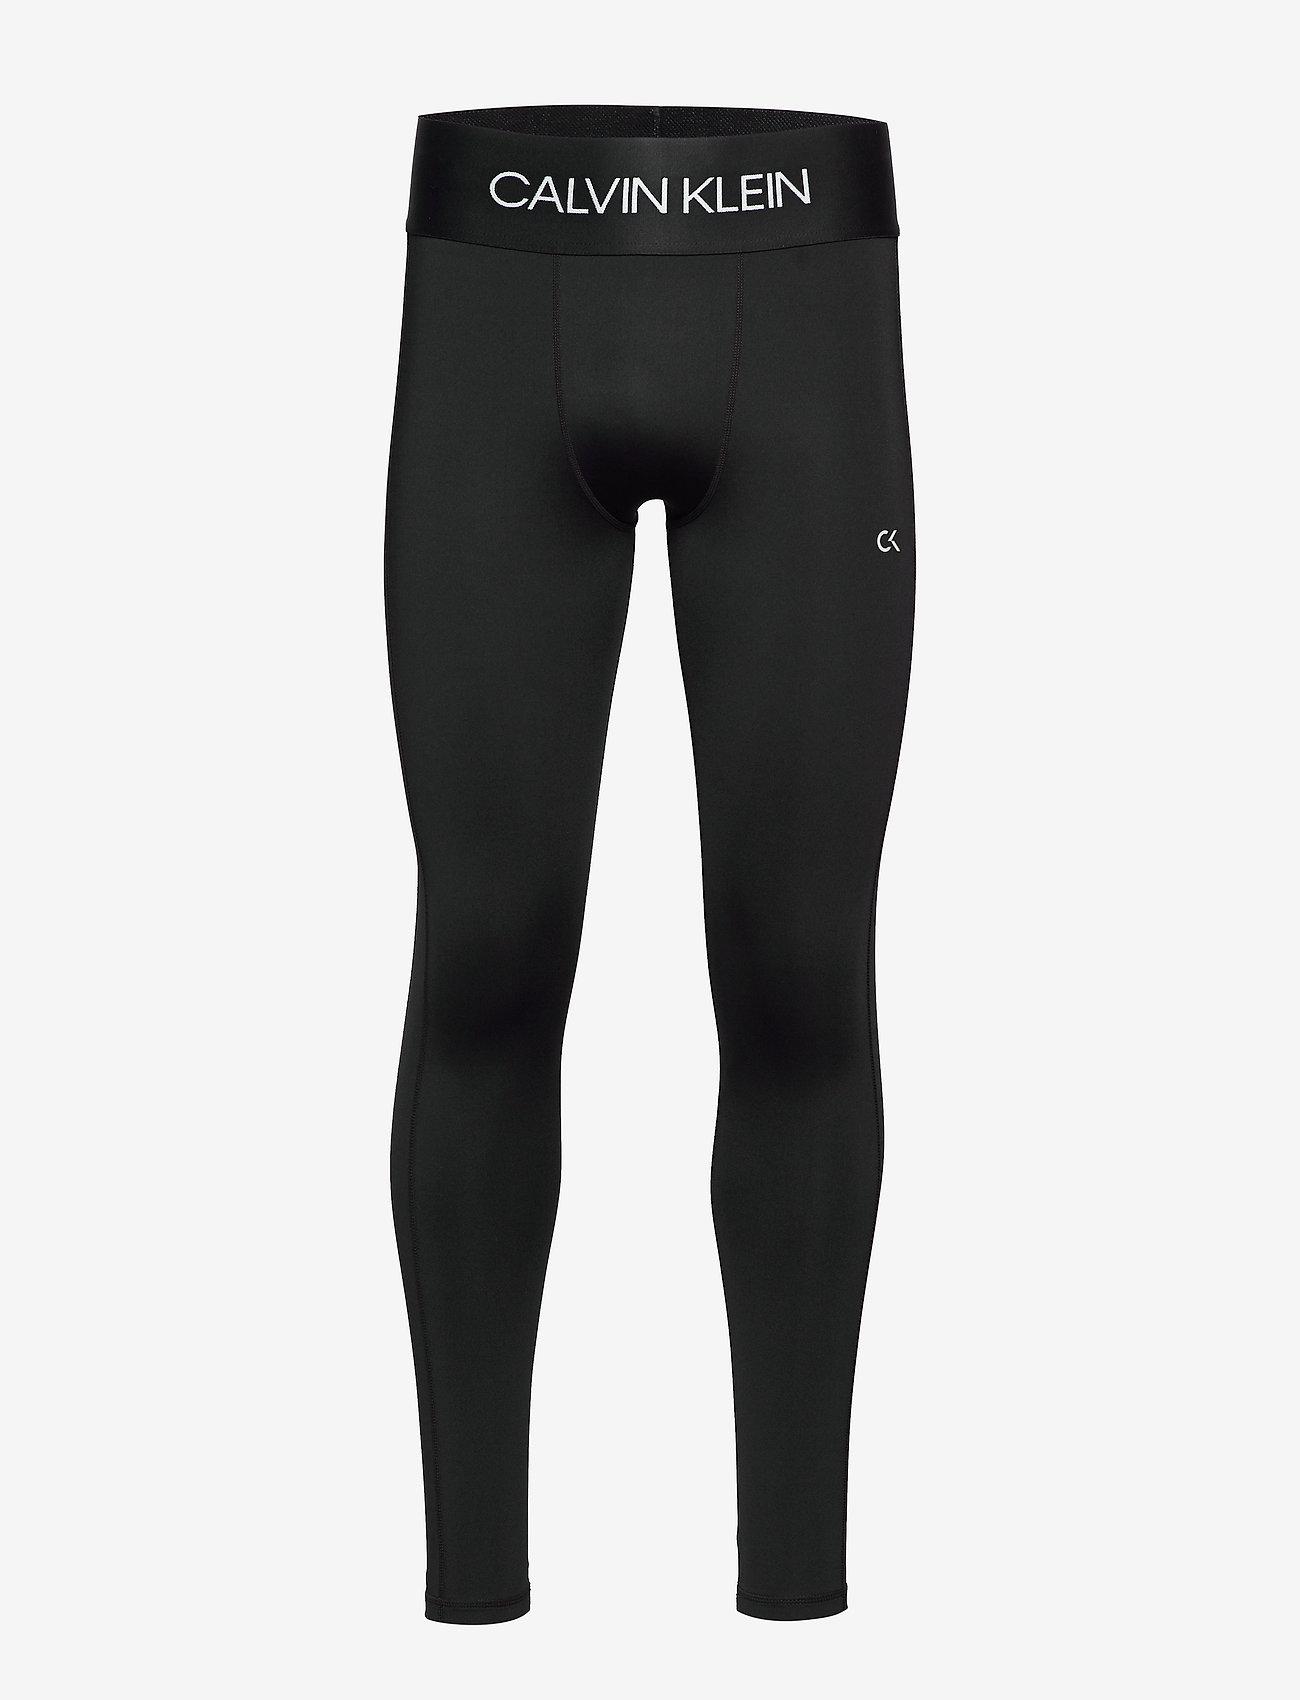 Calvin Klein Performance - FULL LENGTH TIGHT - running & training tights - ck black/bright white - 0